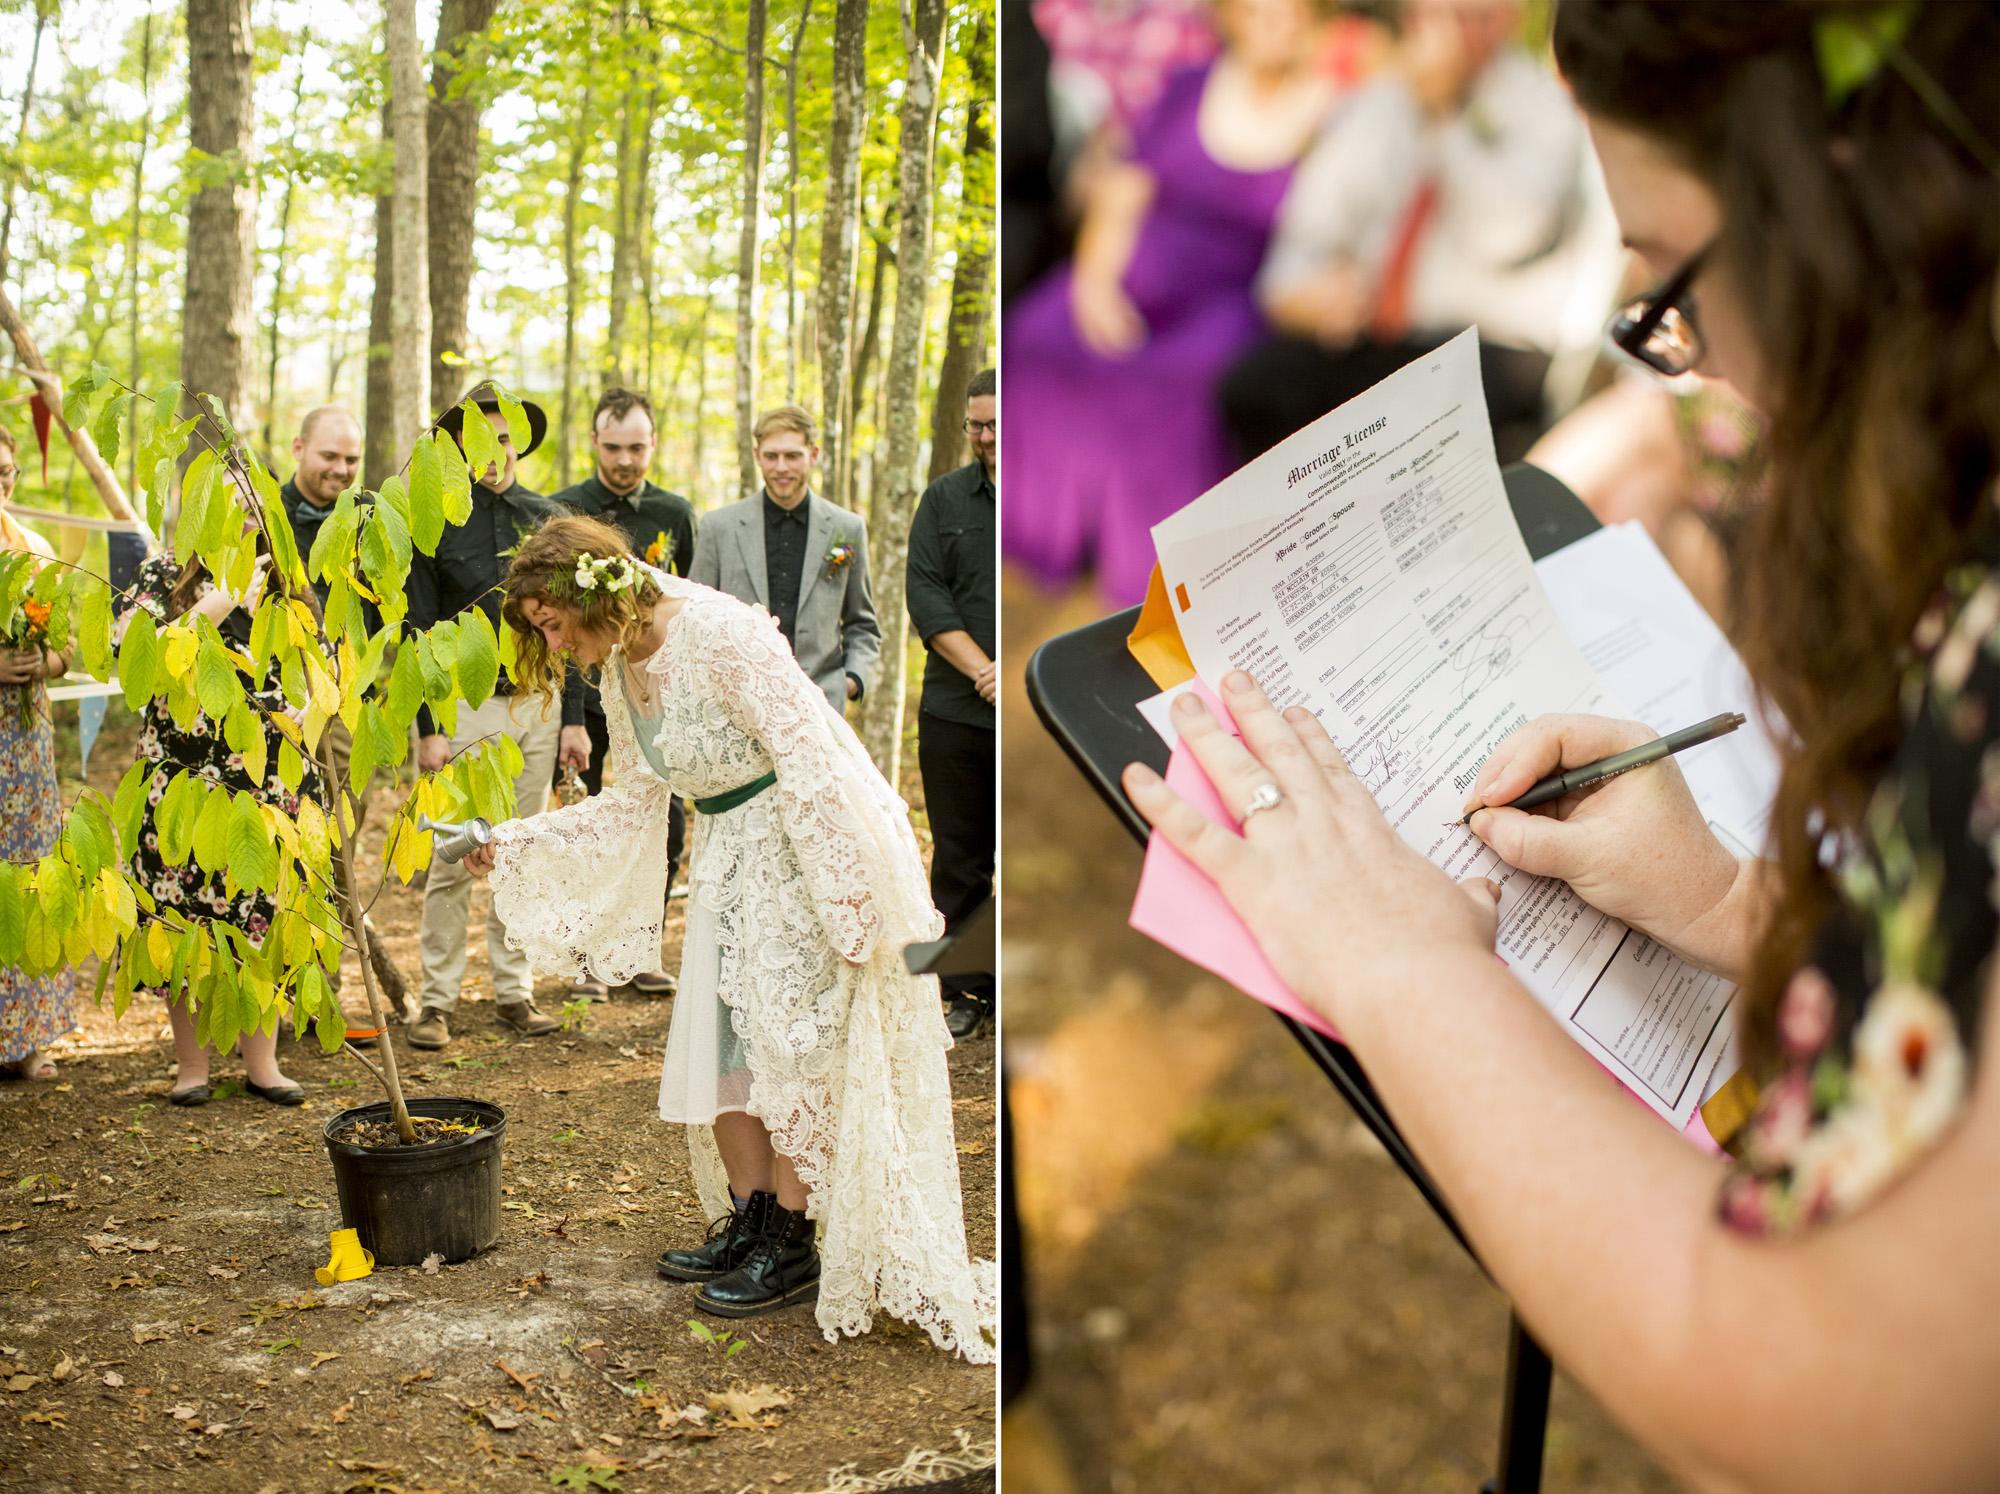 Seriously_Sabrina_Photography_Red_River_Gorge_Kentucky_Wedding_ShawnDana130.jpg